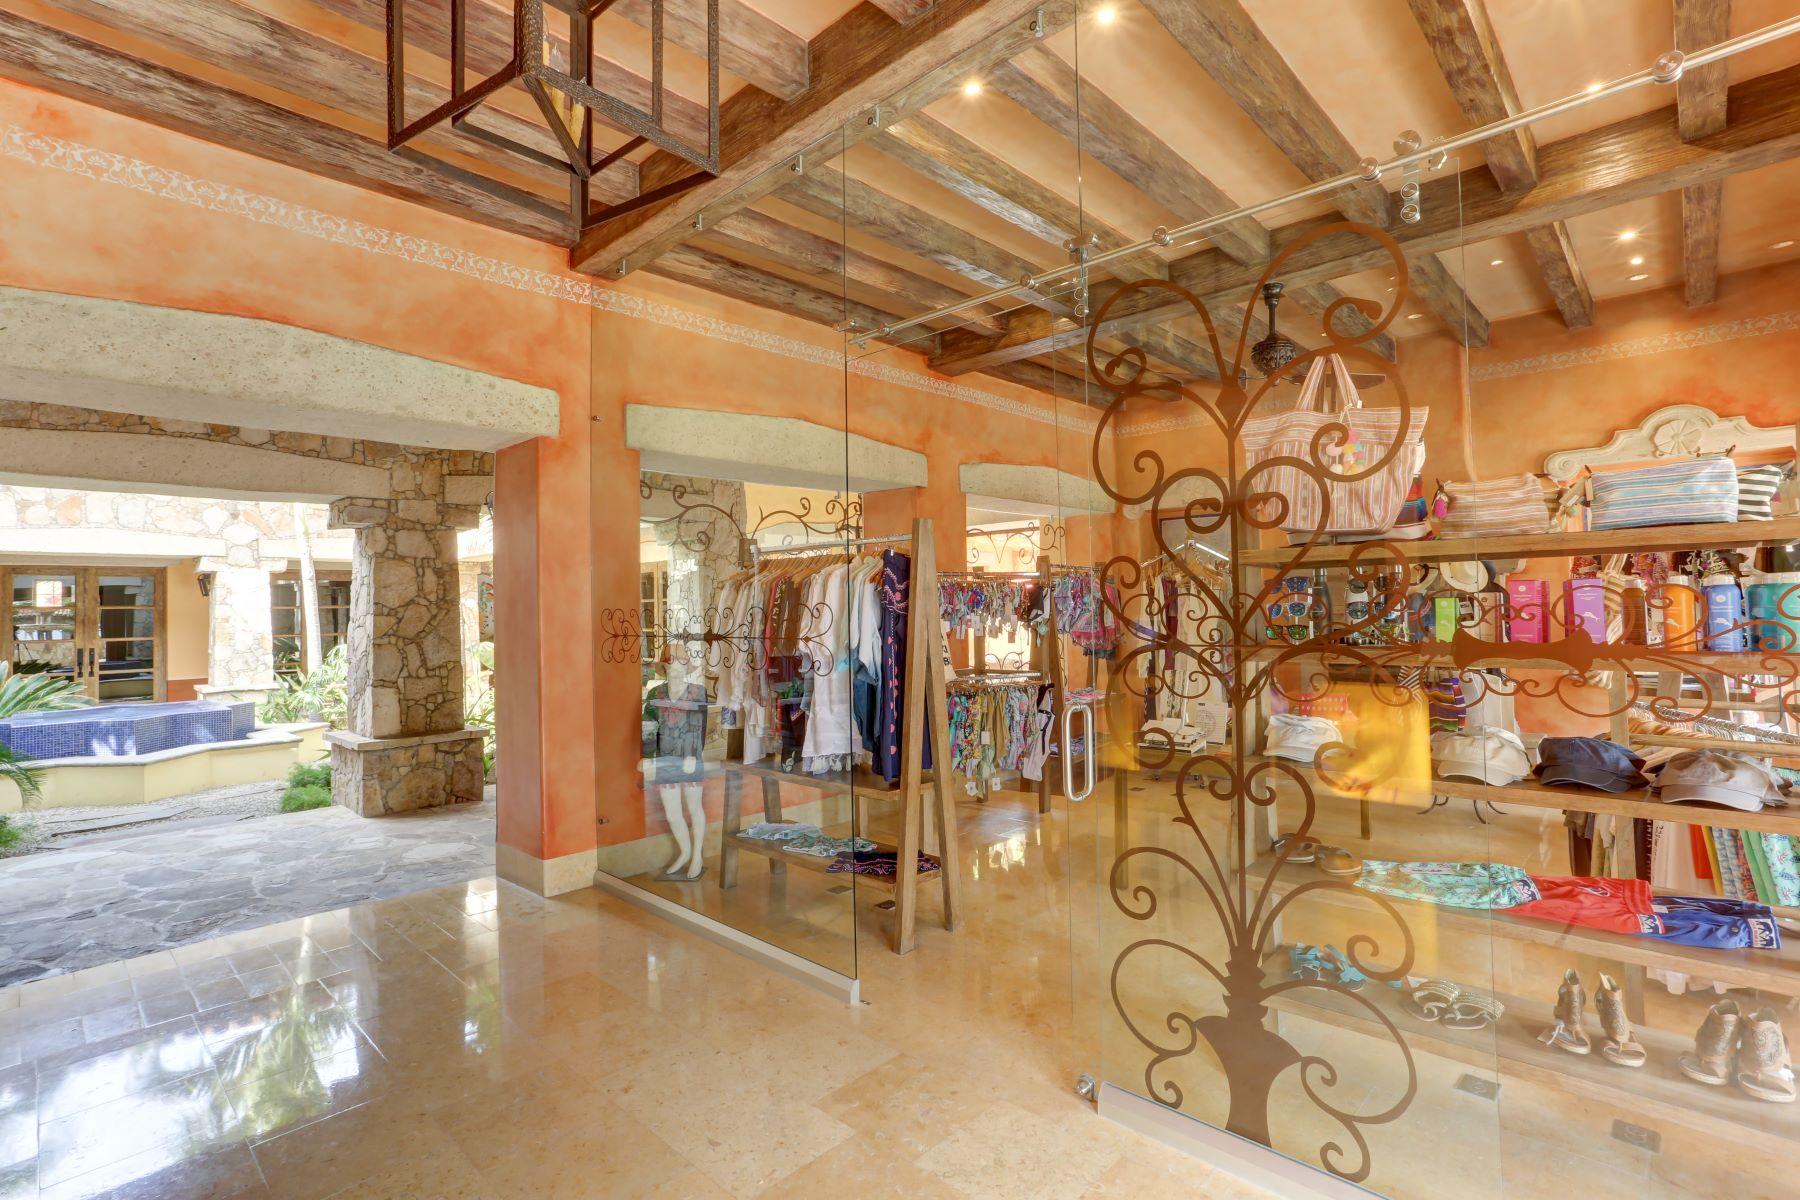 Additional photo for property listing at Hacienda 2-304 Cabo San Lucas, Baja California Sur México